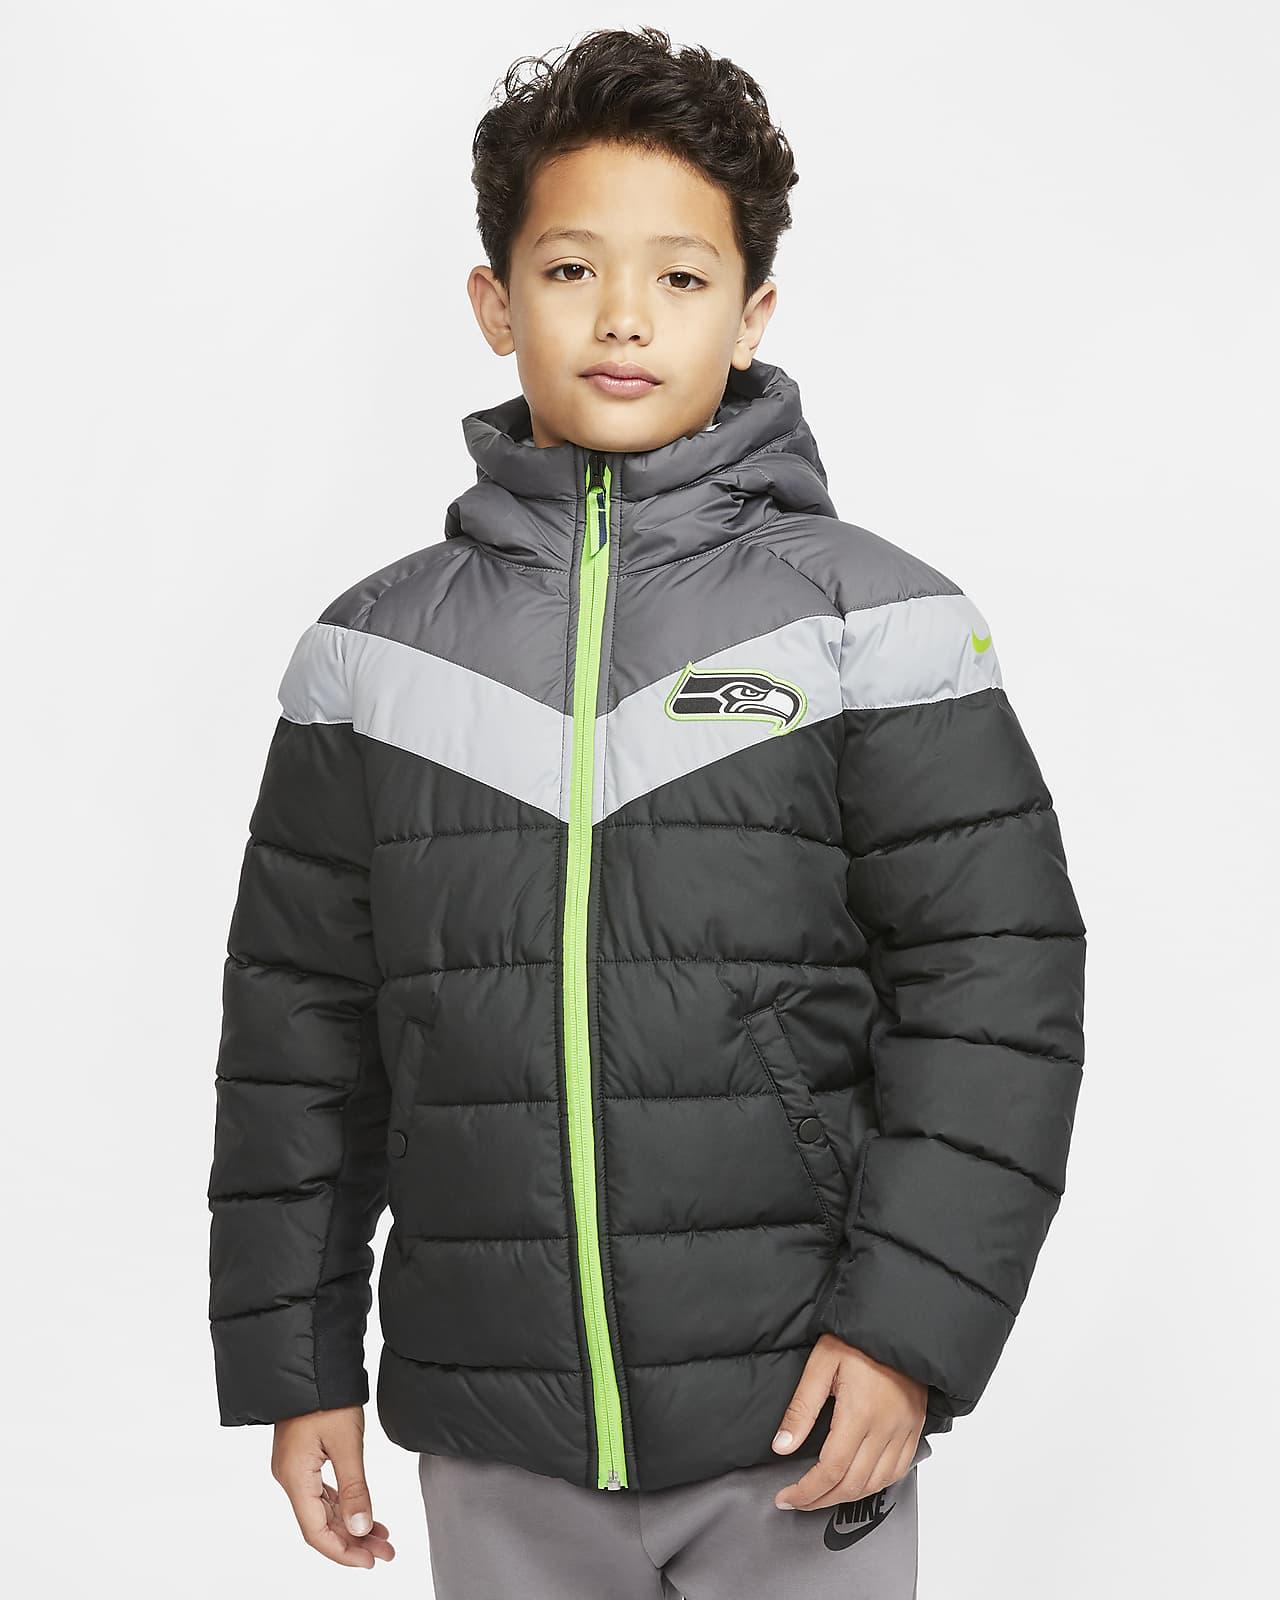 Nike (NFL Seahawks) Big Kids' Hooded Puffer Jacket